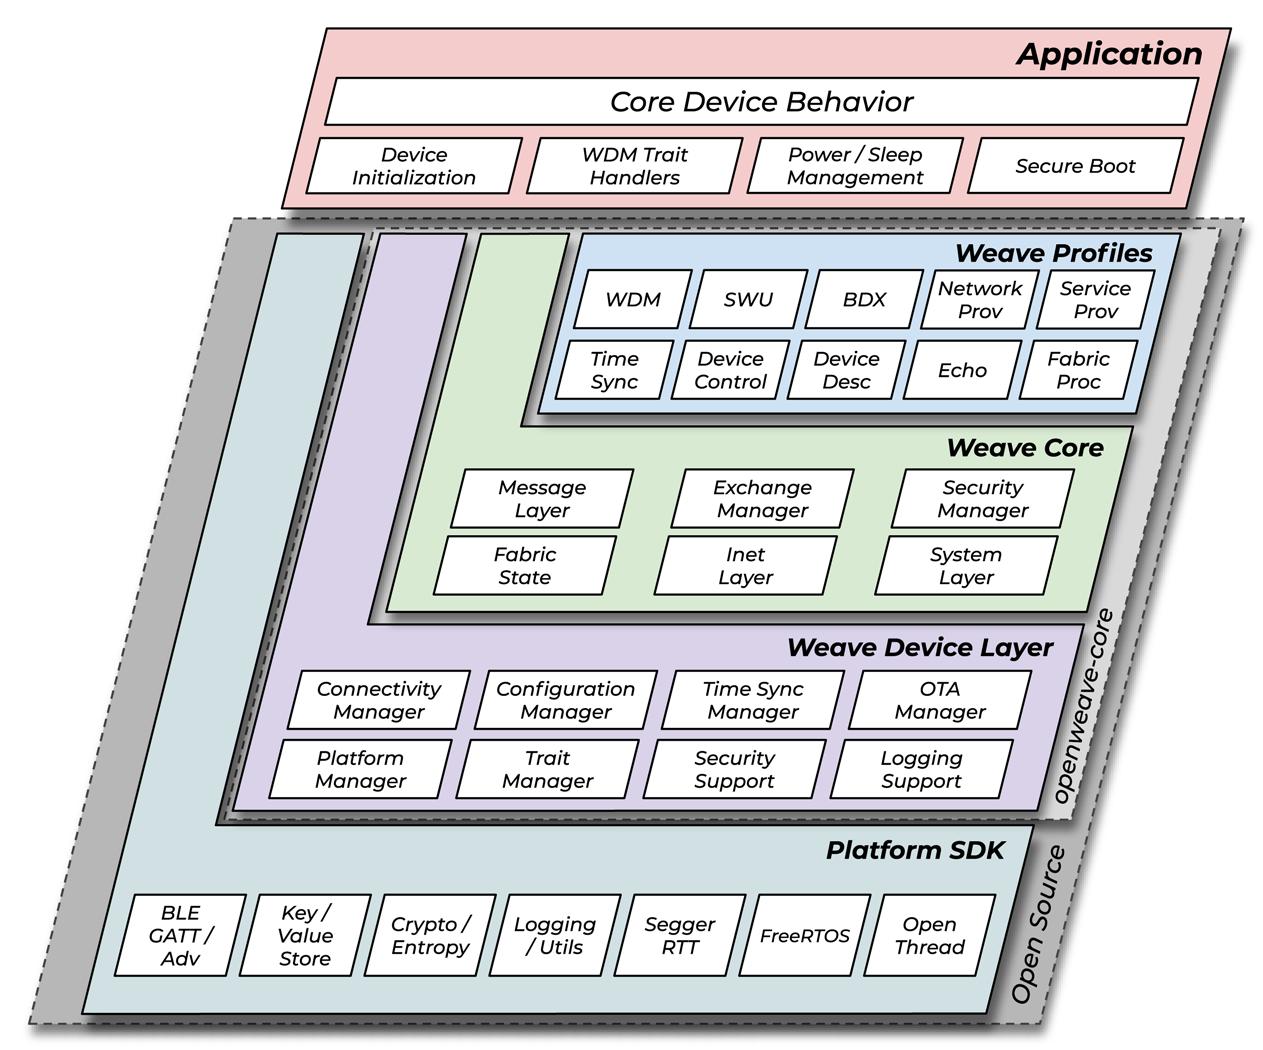 معماری لایه دستگاه OpenWeave